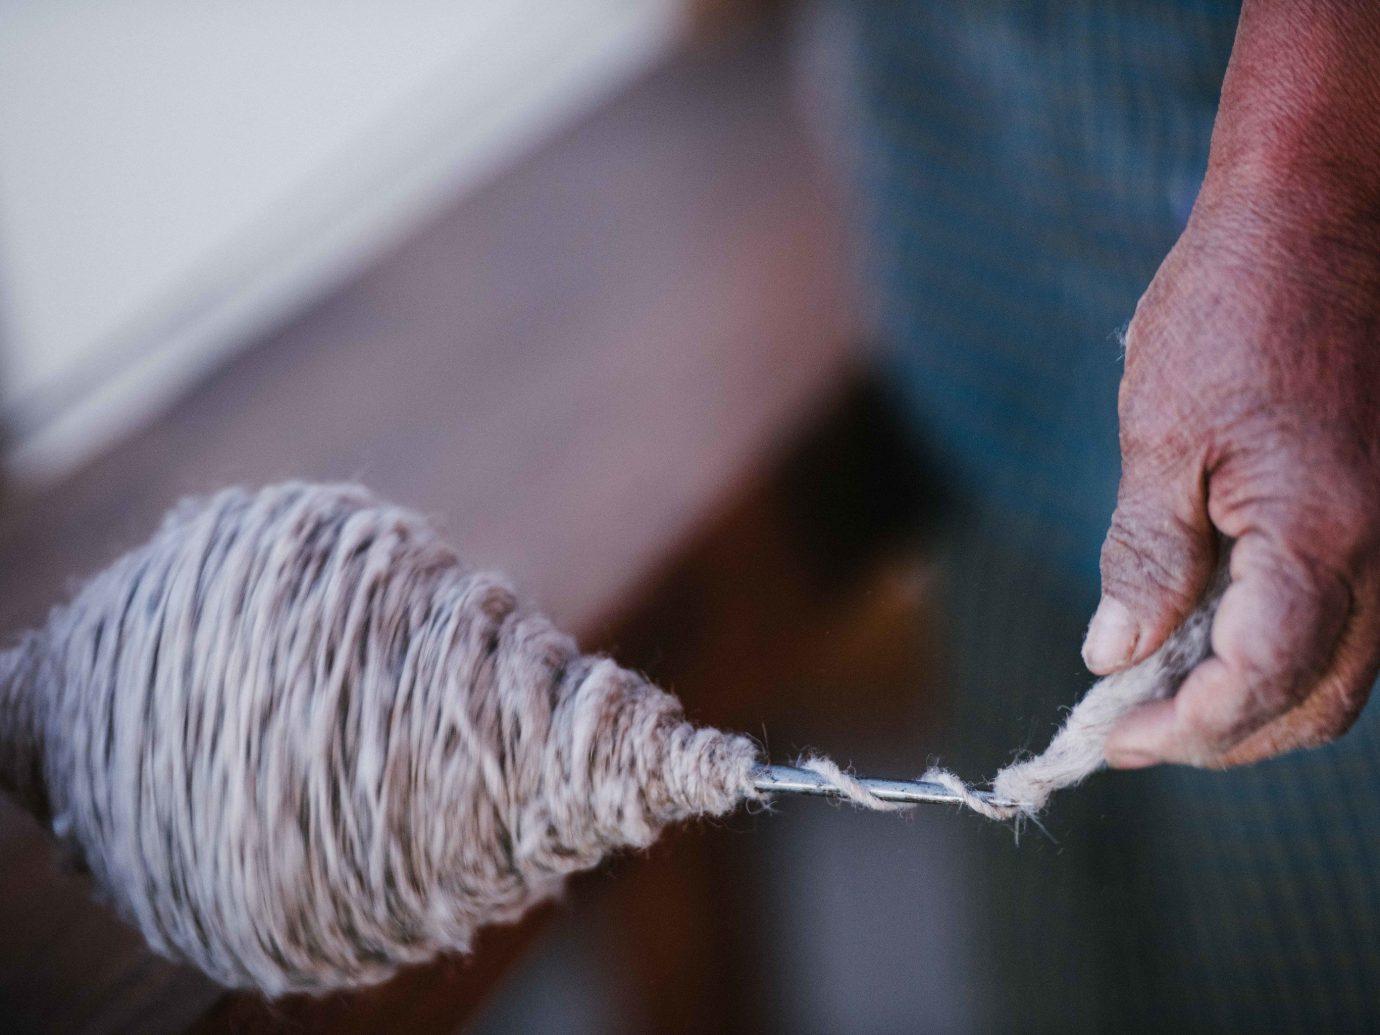 Arts + Culture Mexico Oaxaca Trip Ideas person indoor rope thread hand wool finger close feet